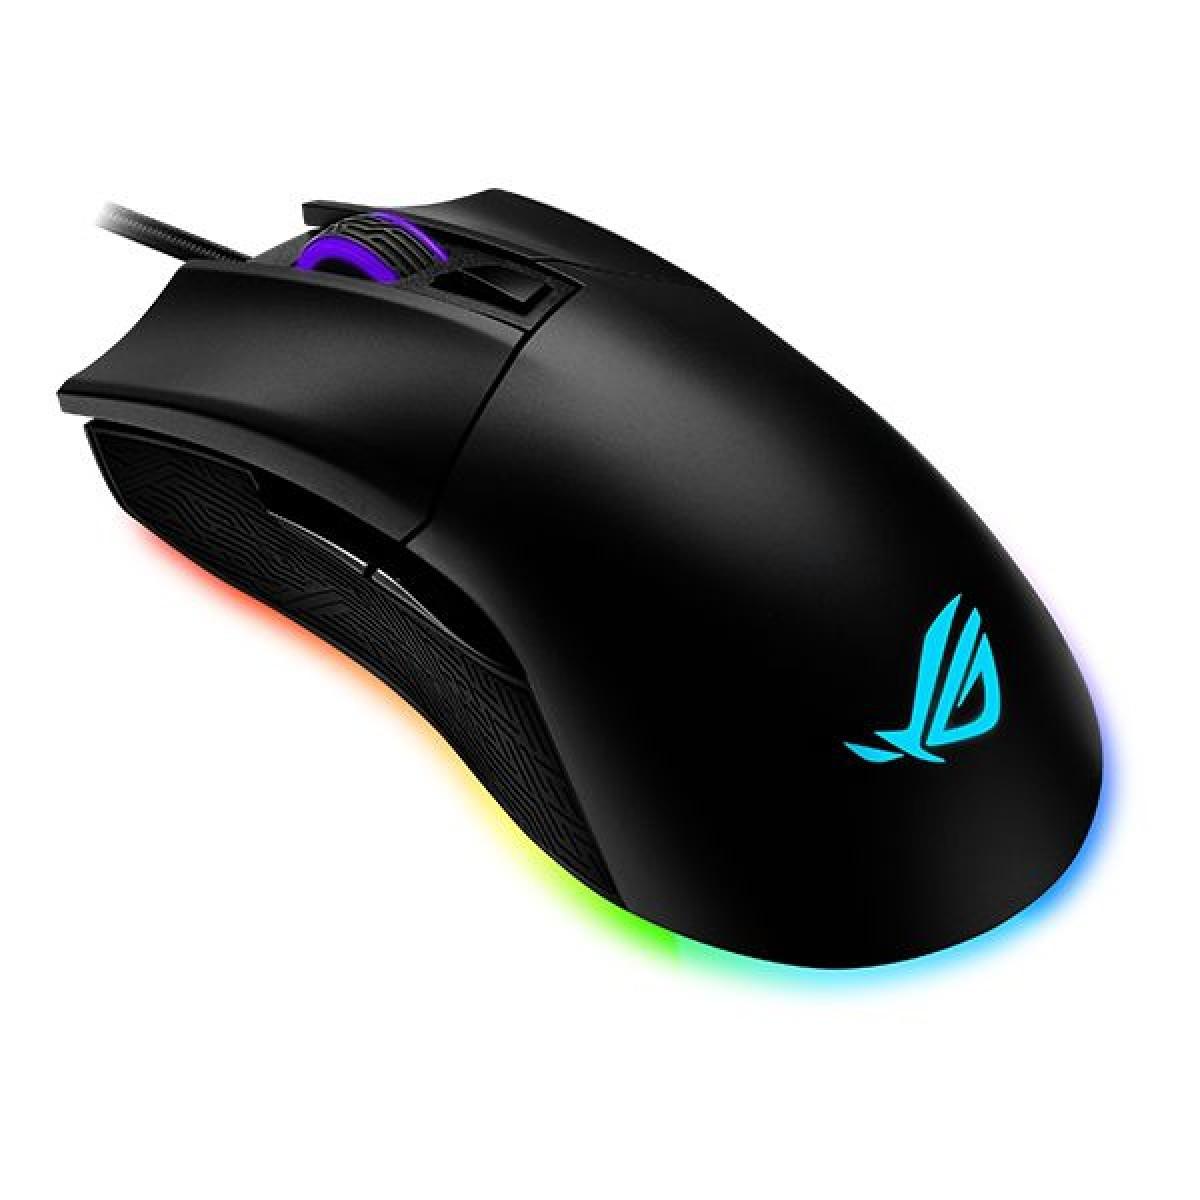 Mouse Gamer Asus Rog Gladius II Origin RGB, 12000 DPI, 5 Botões, Óptico, Black, 90MP00U1-B0UA00